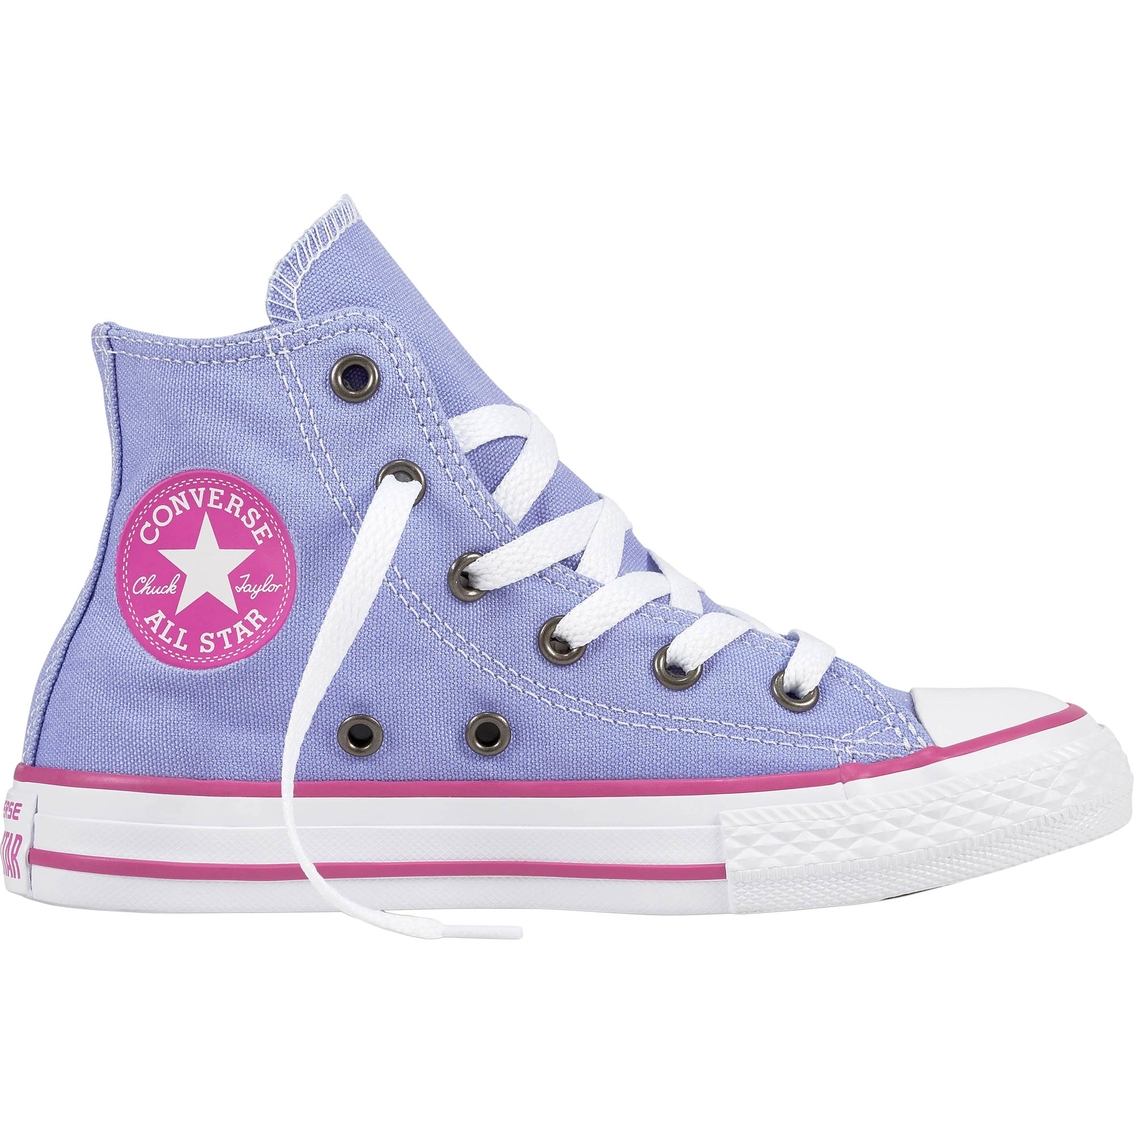 Converse Preschool Girls Chuck Taylor All Star High Top Sneakers ... 6ecf2ec03